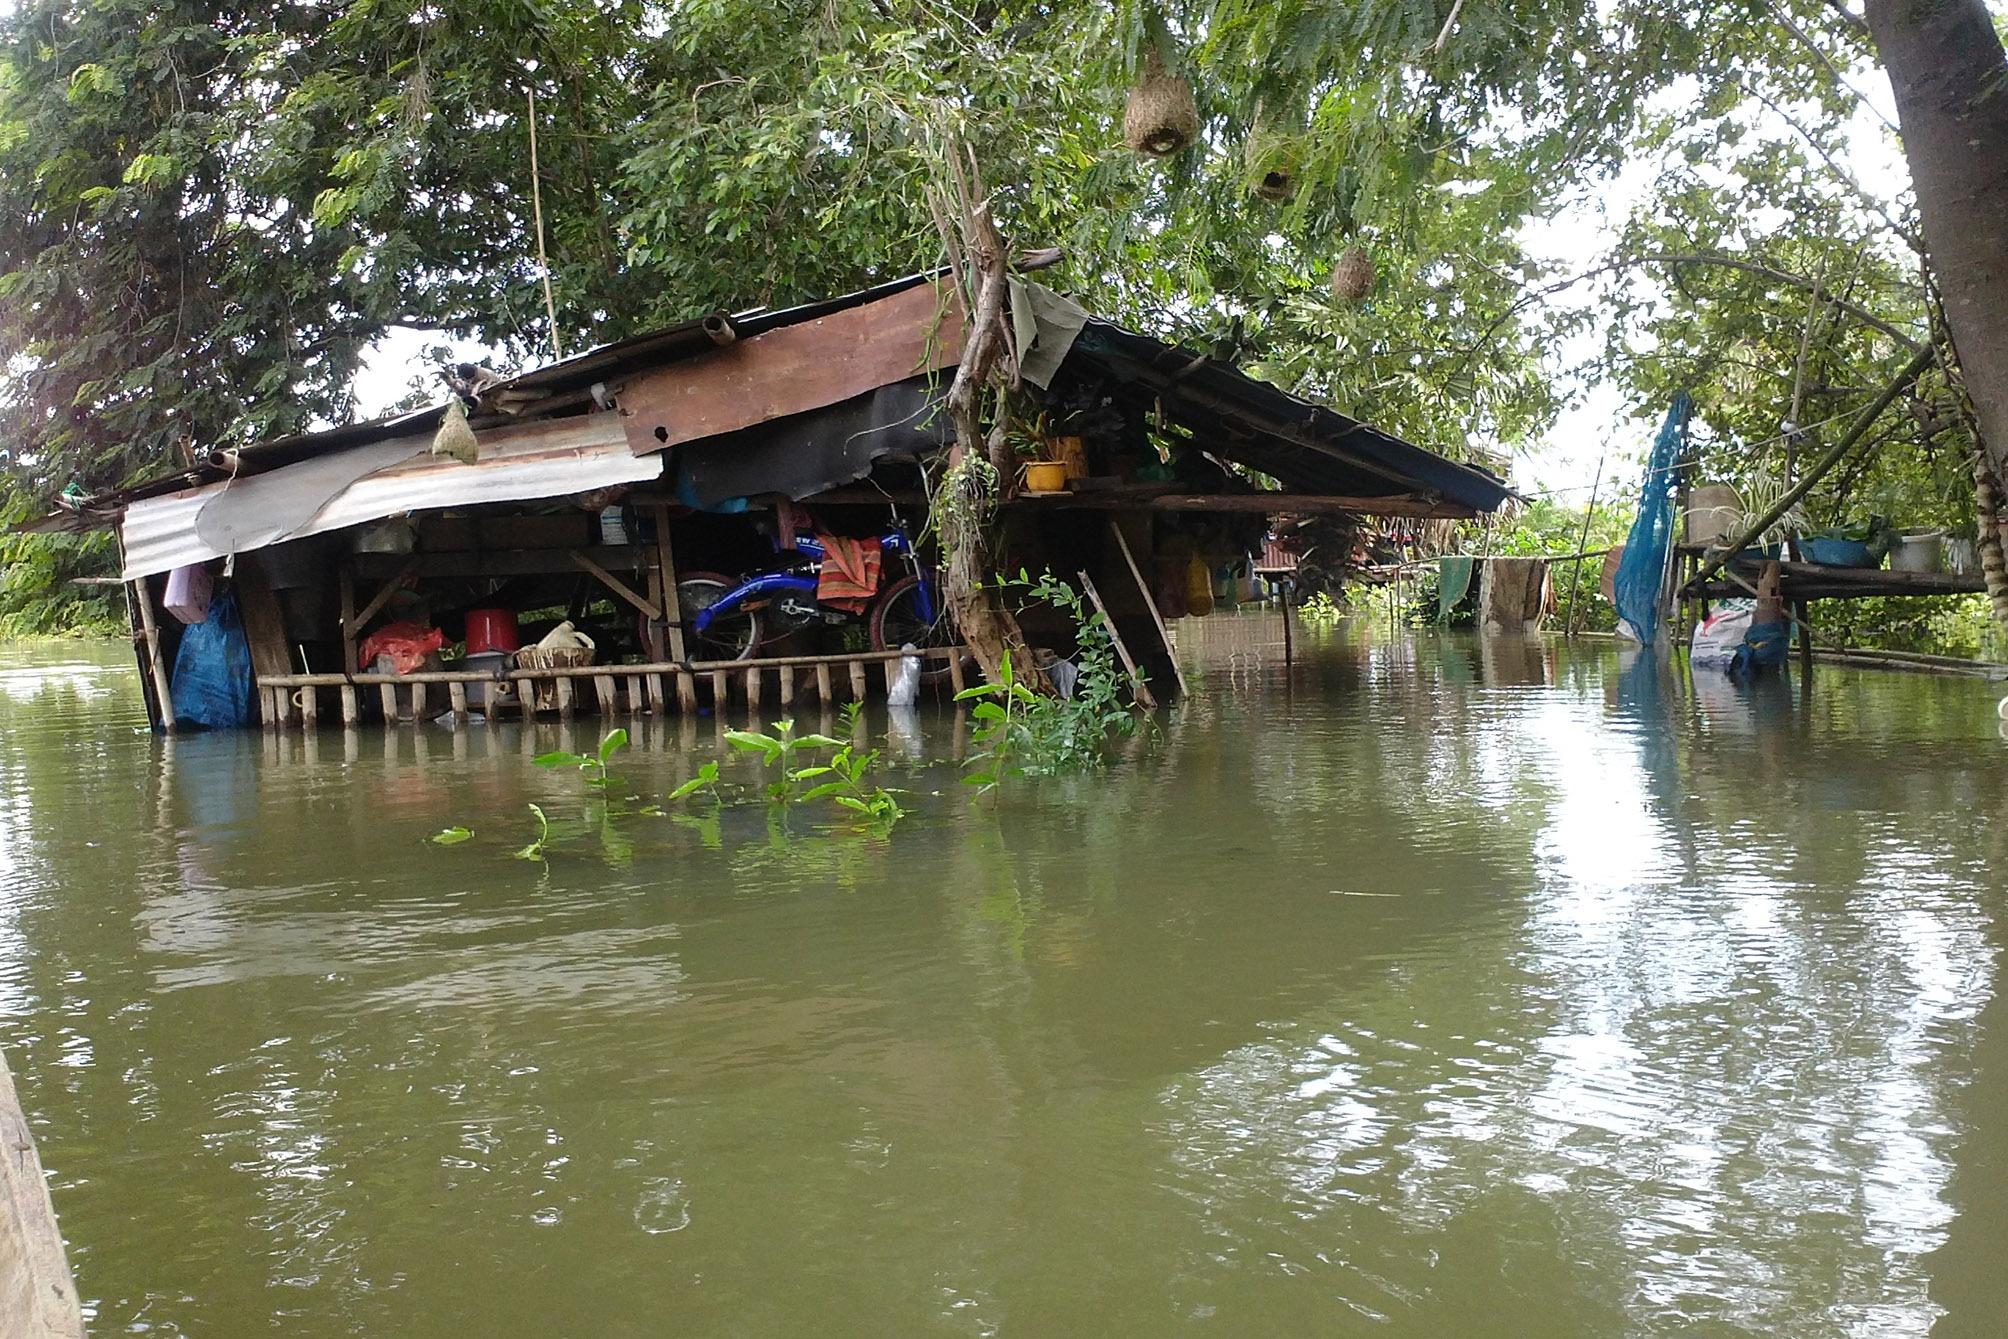 TLC Flood Appeal 2